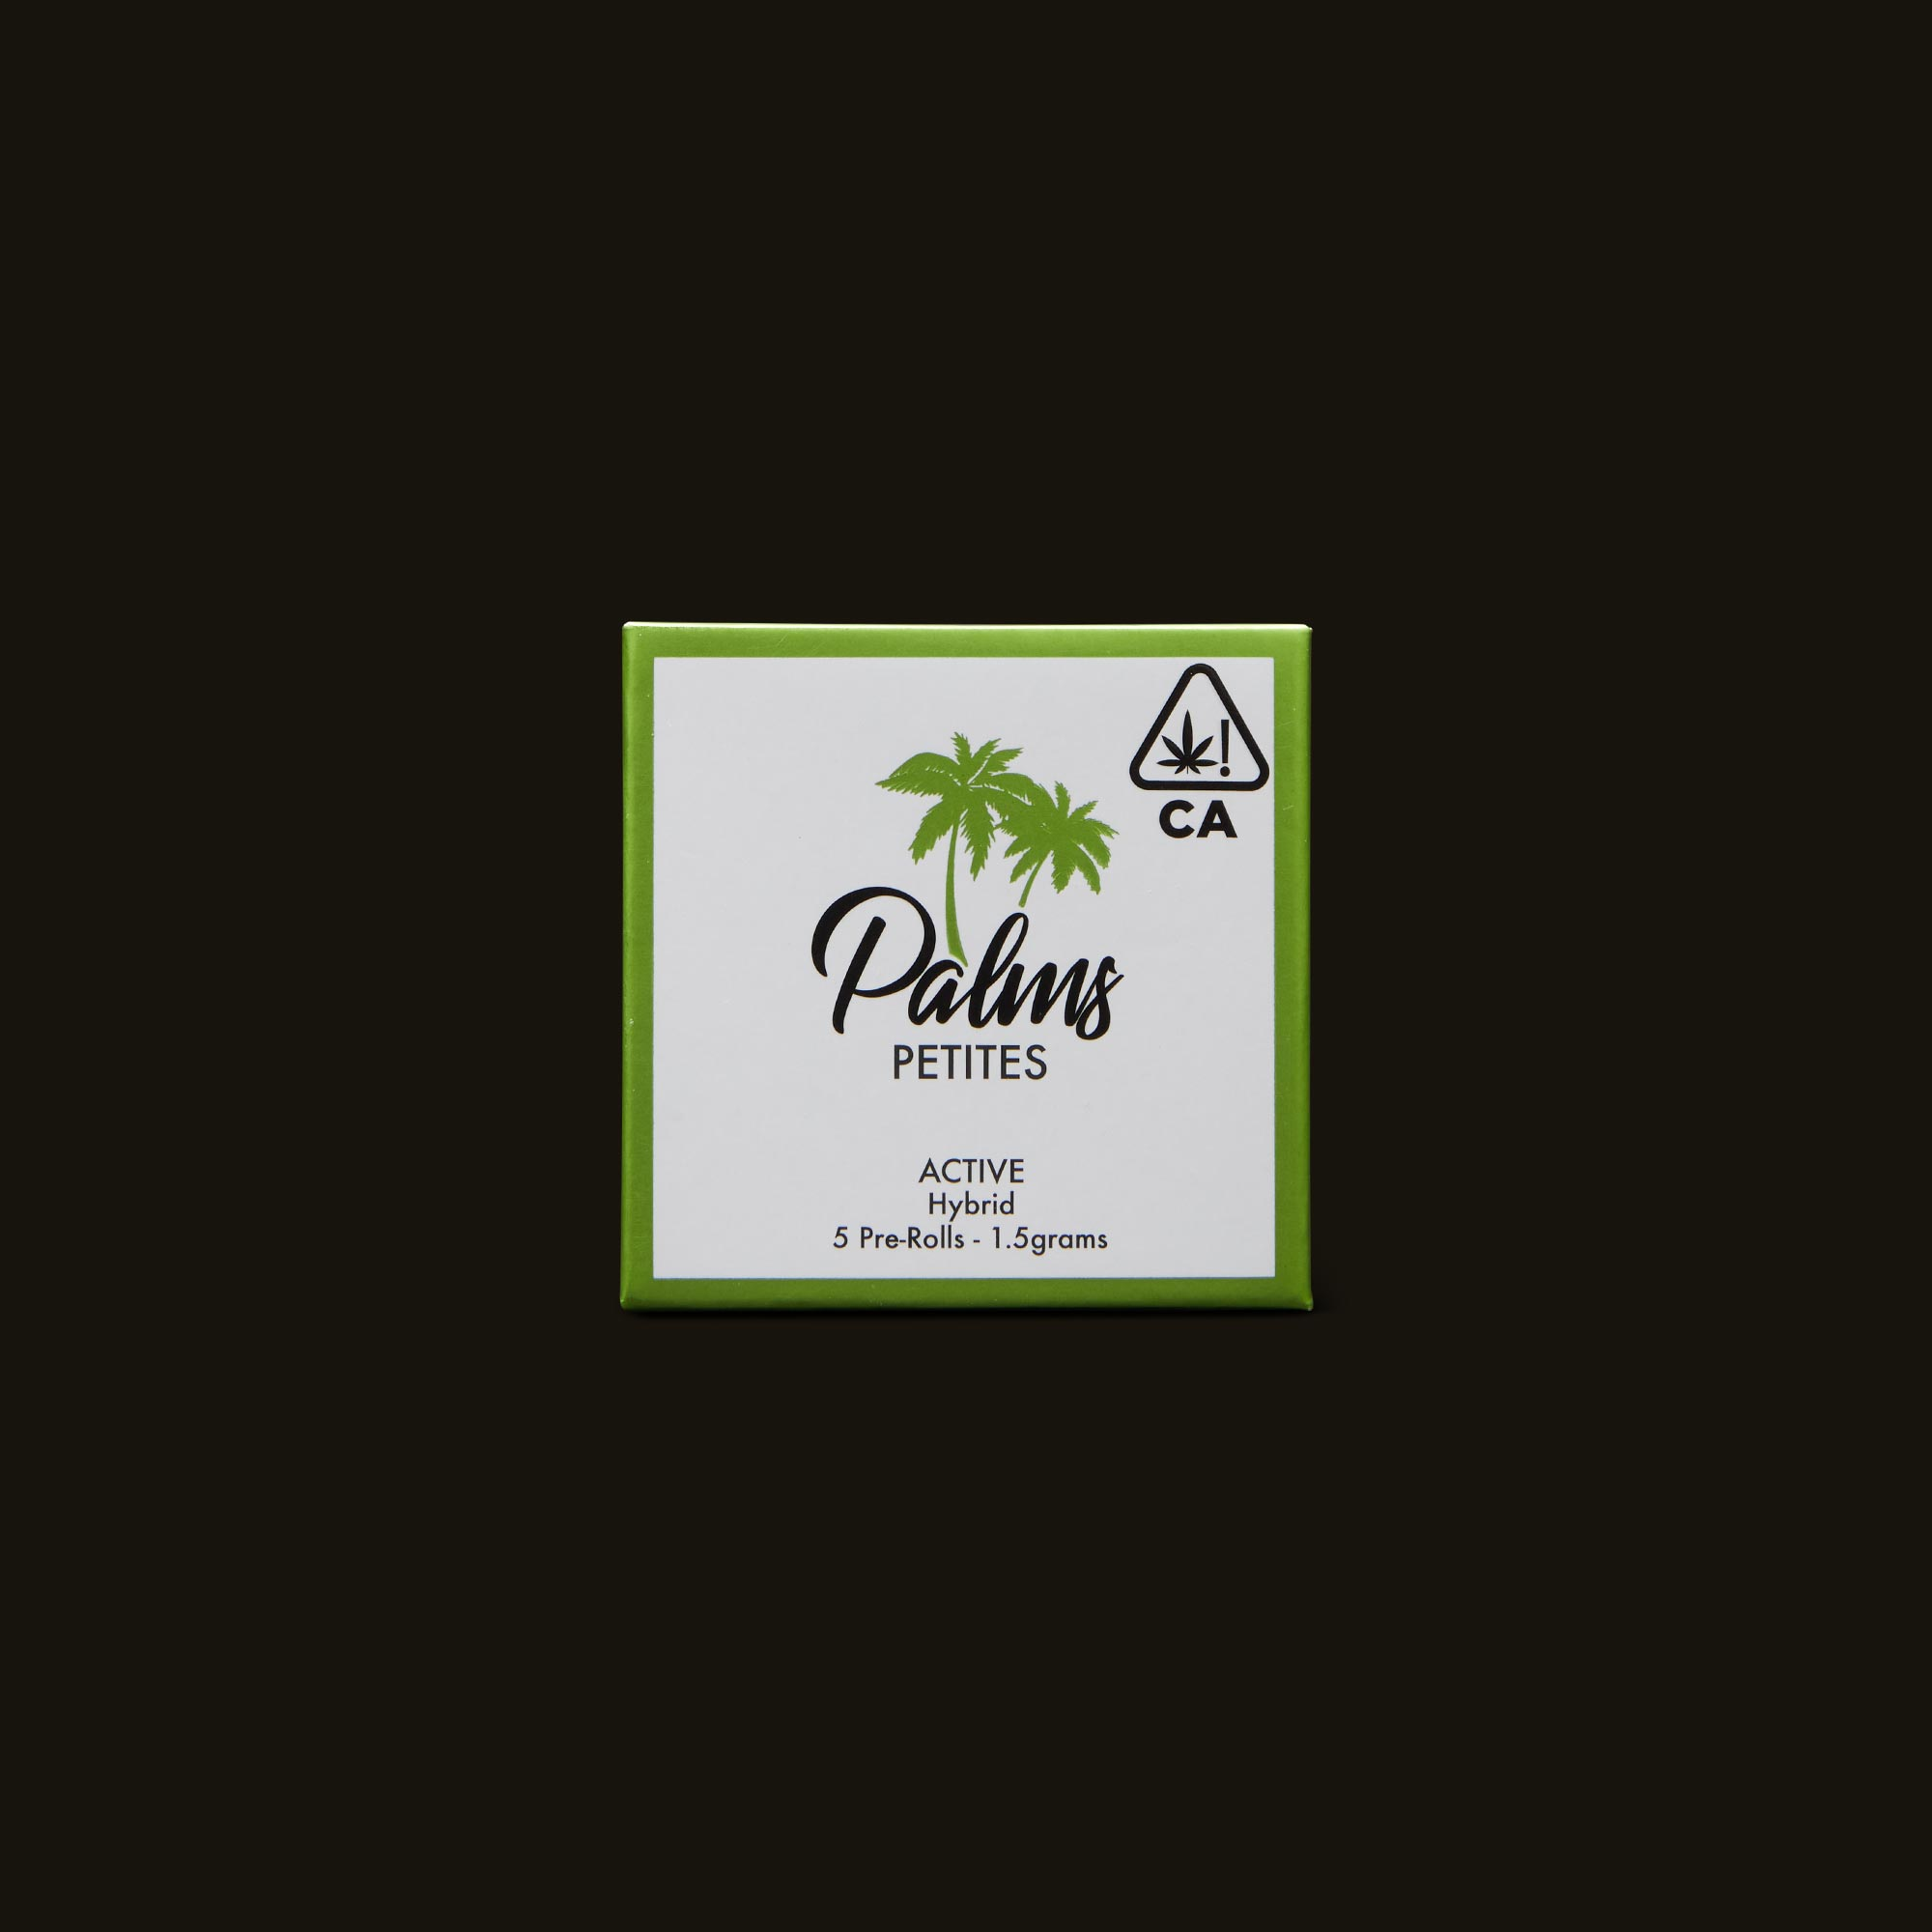 Palms Active Petites 5-Pack Front Box